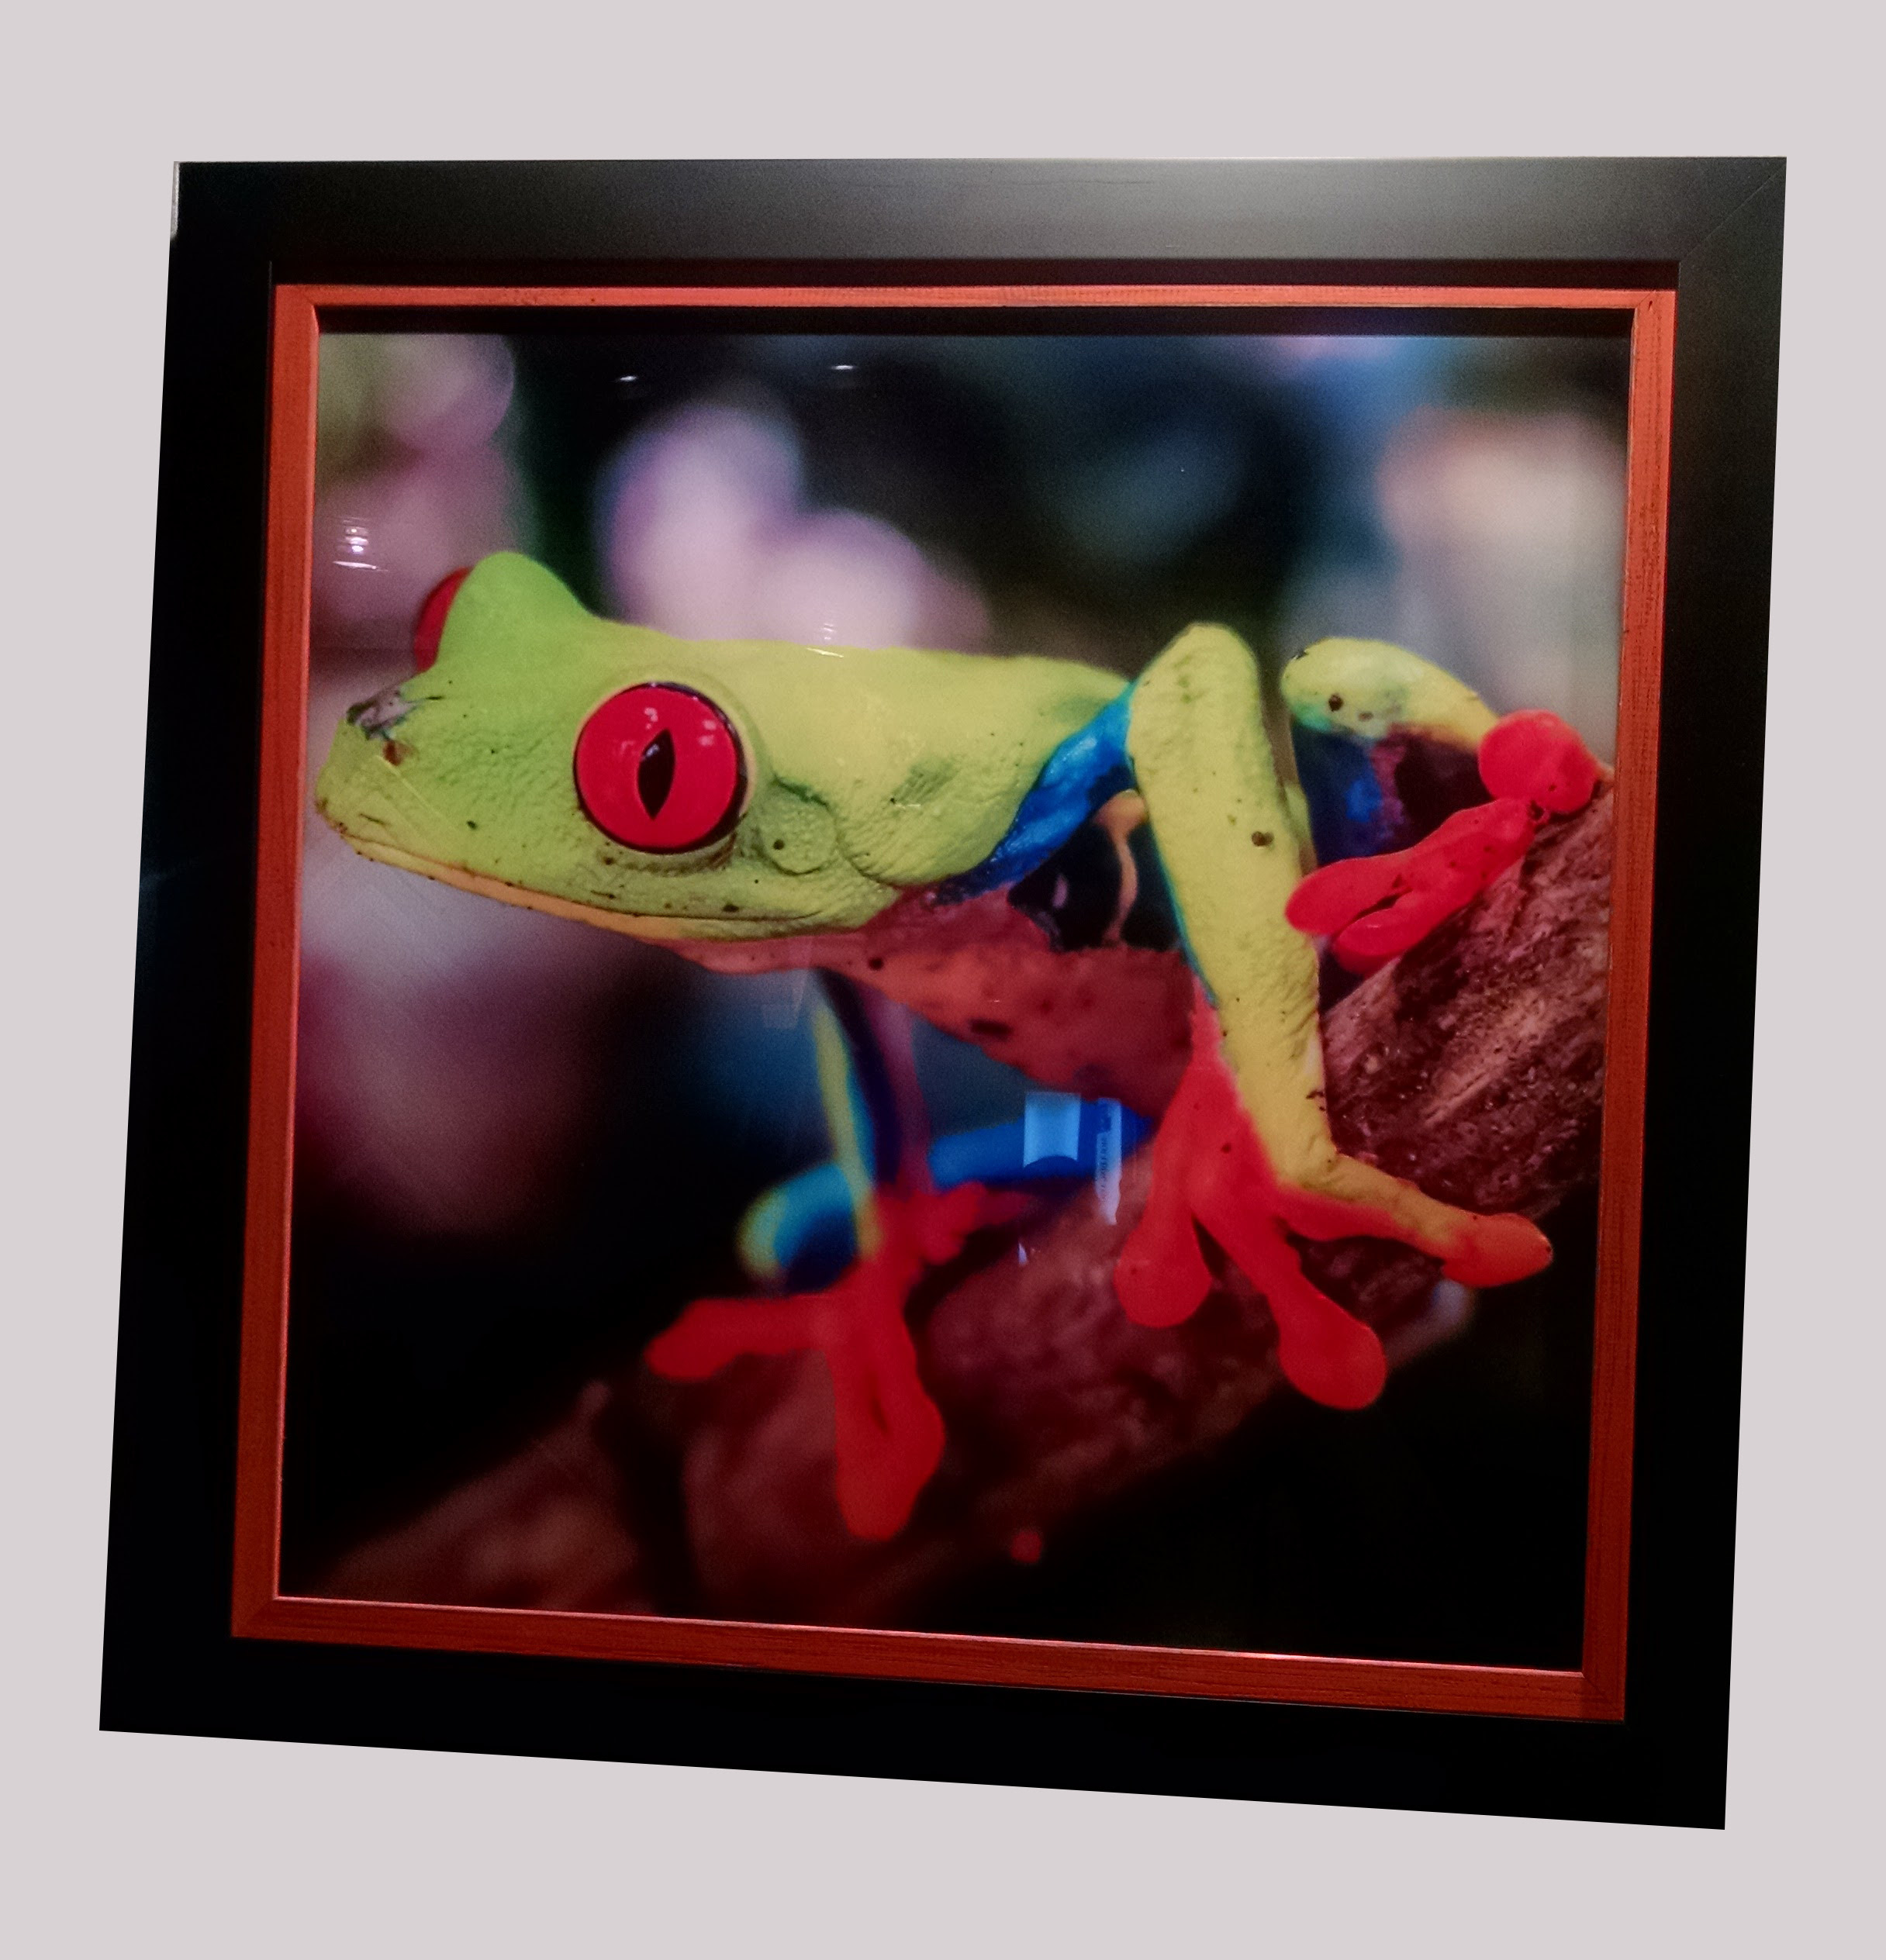 Fine Art Photography Framing Allan Jeffries Framing